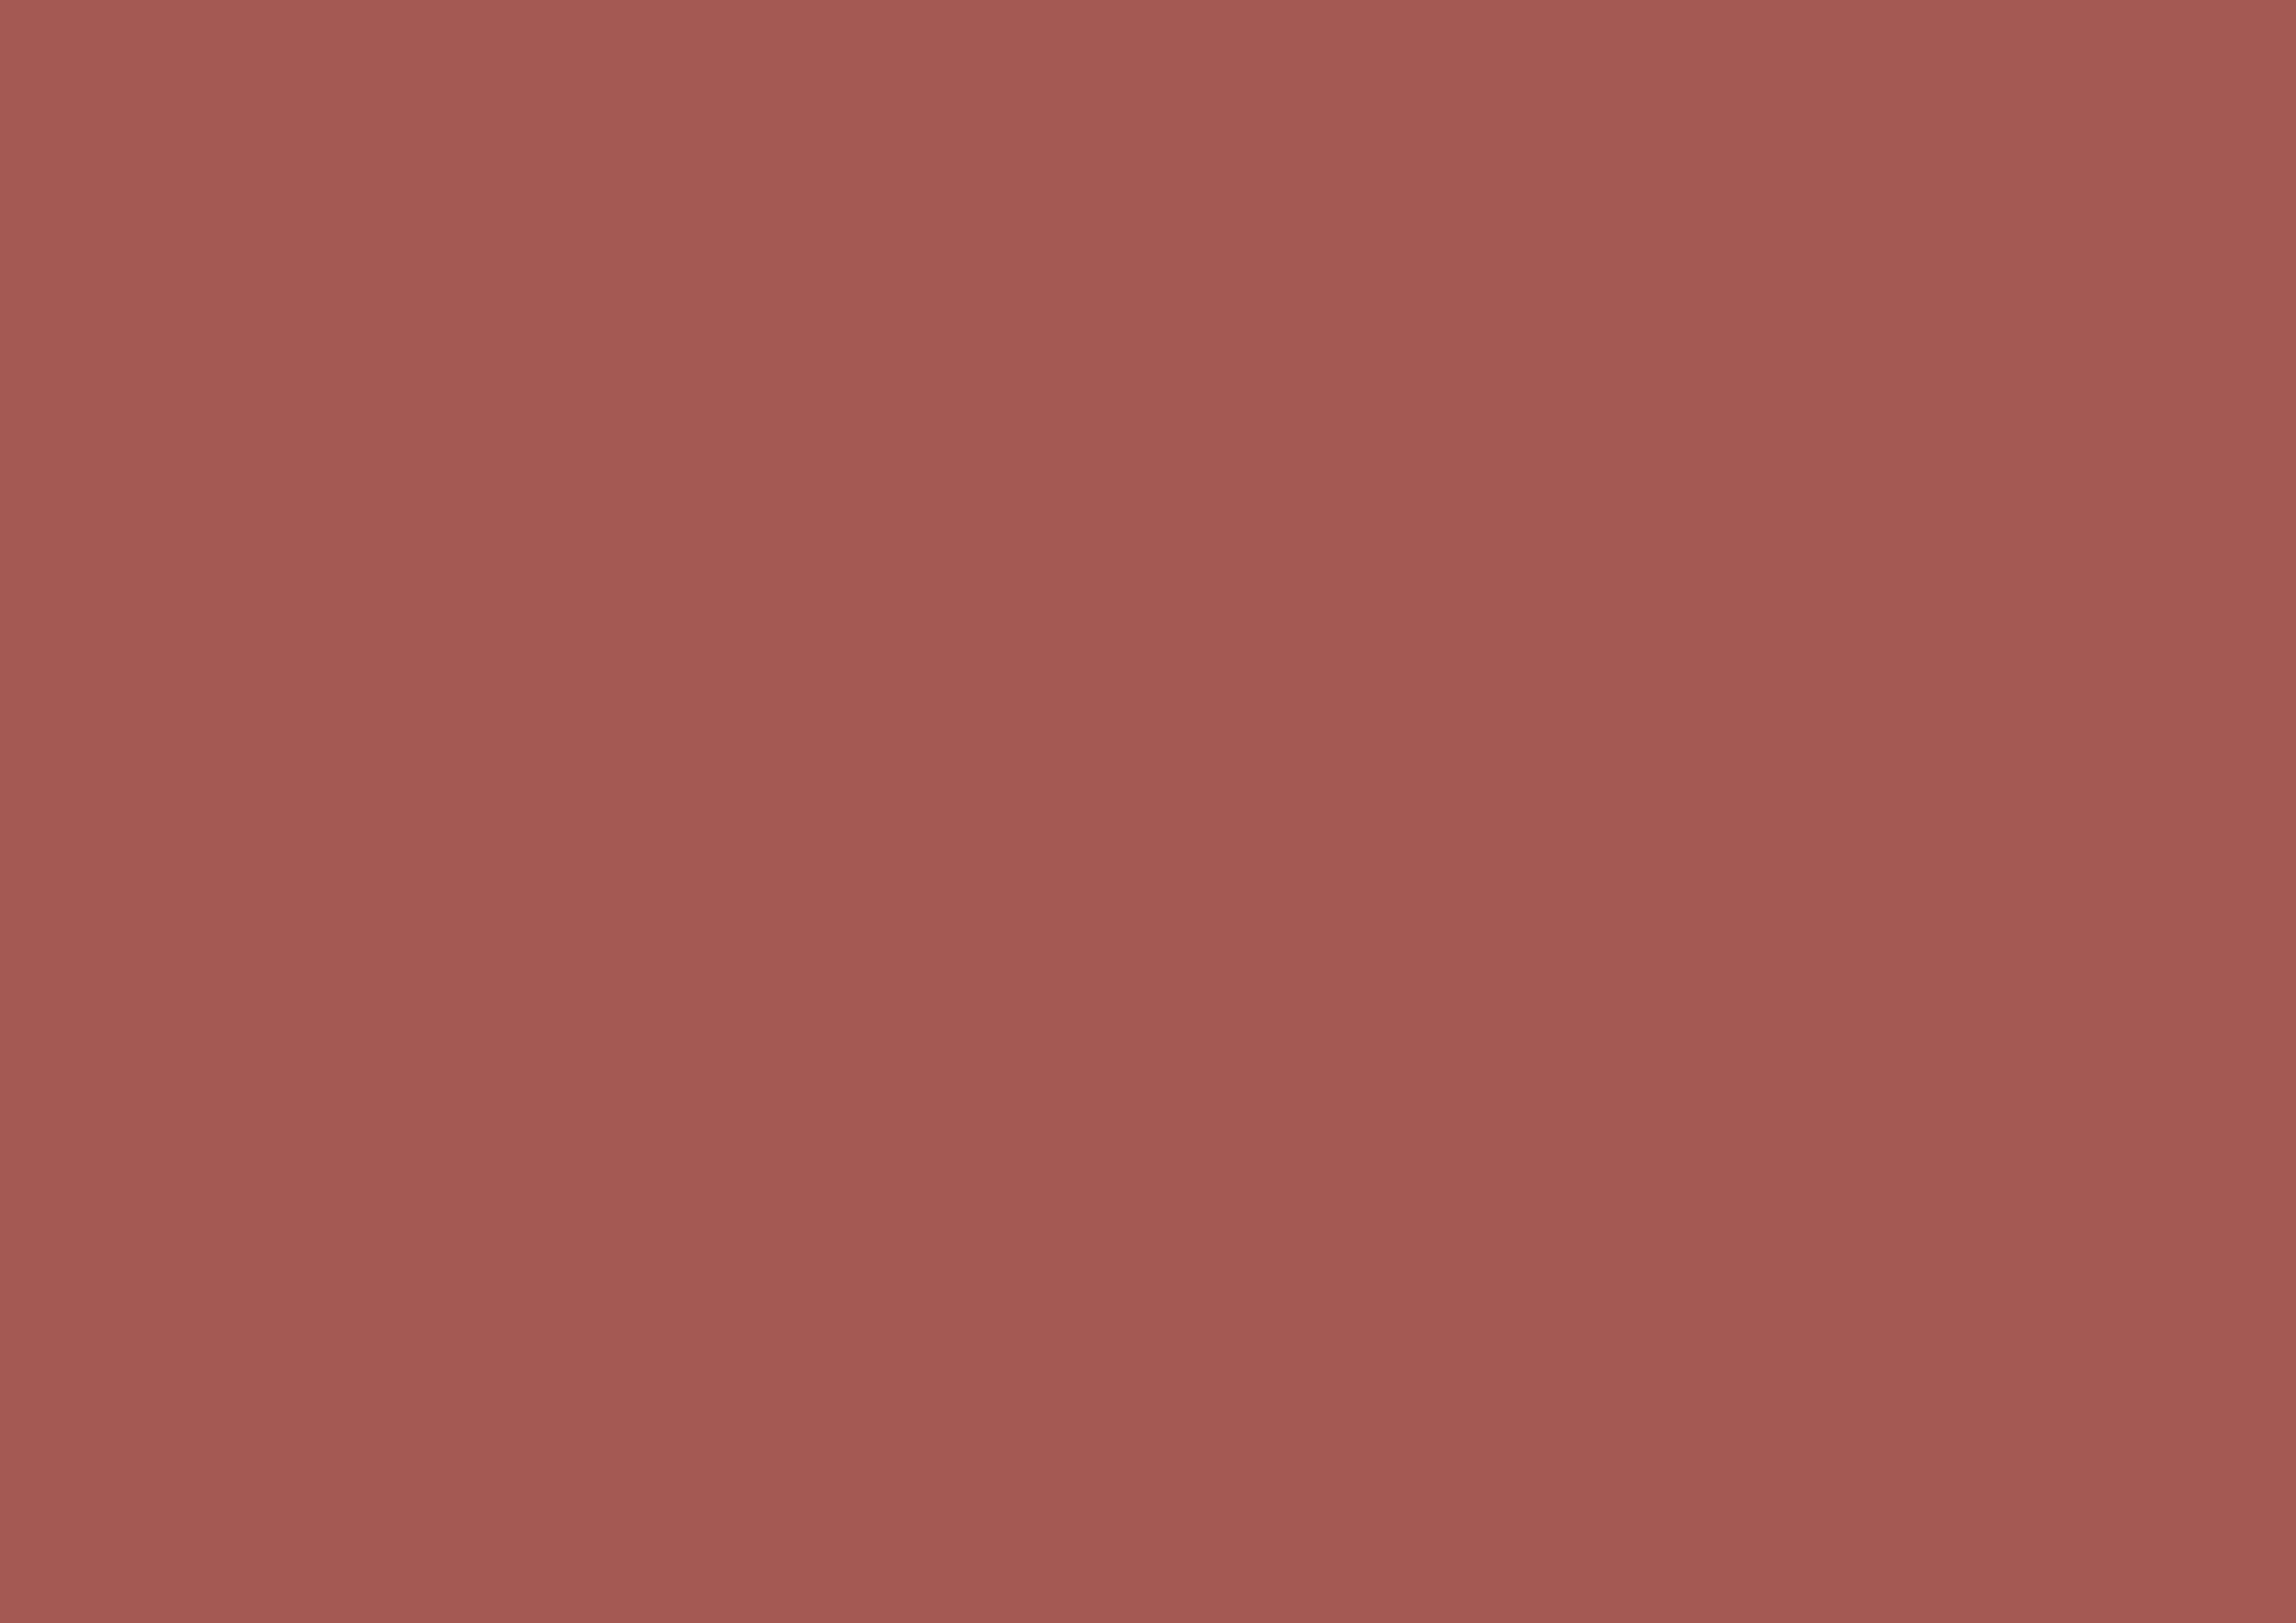 3508x2480 Redwood Solid Color Background